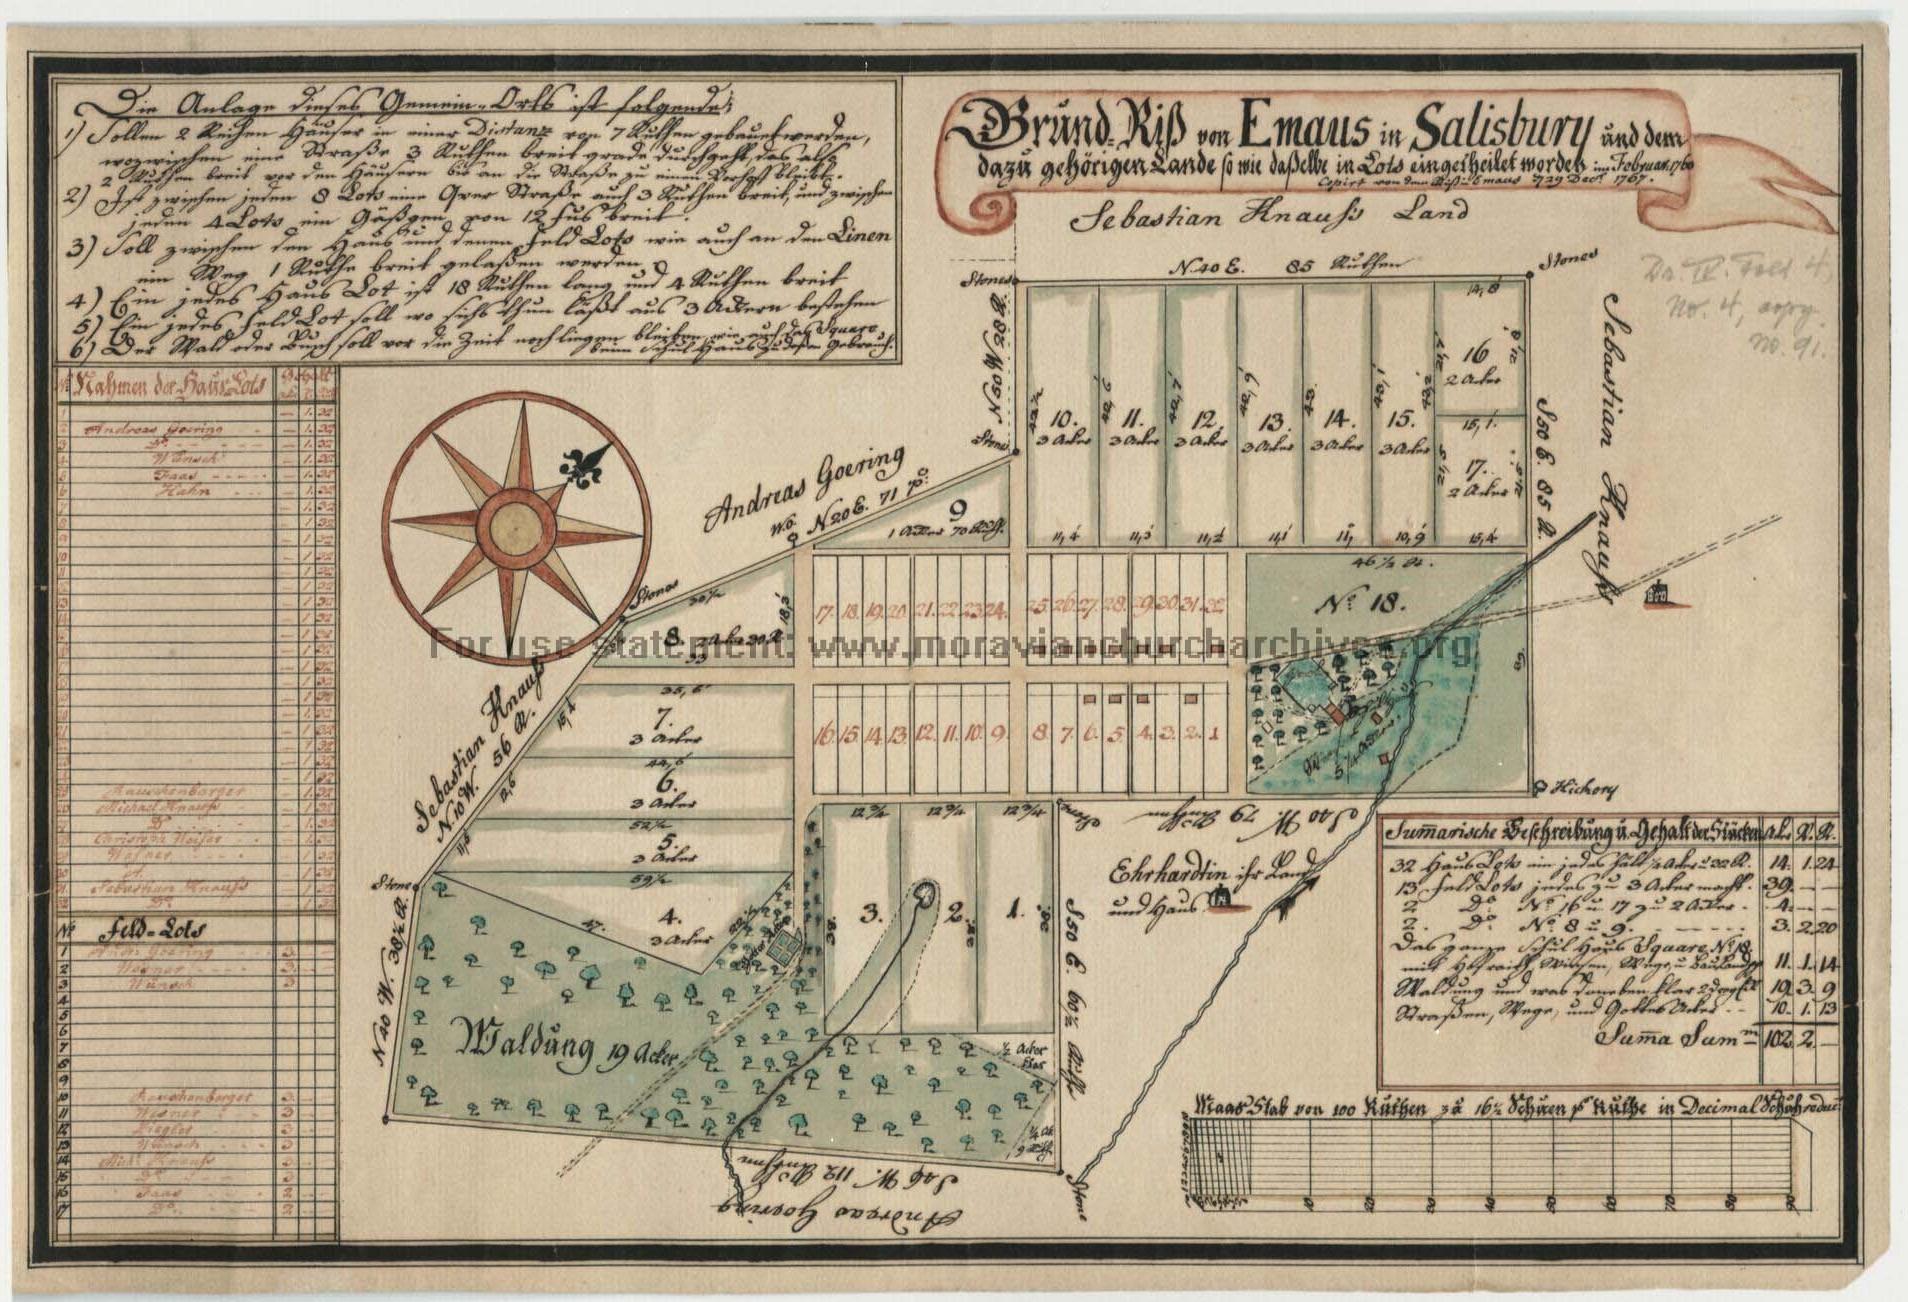 Digital Collection Spotlight #21: Map of Emmaus